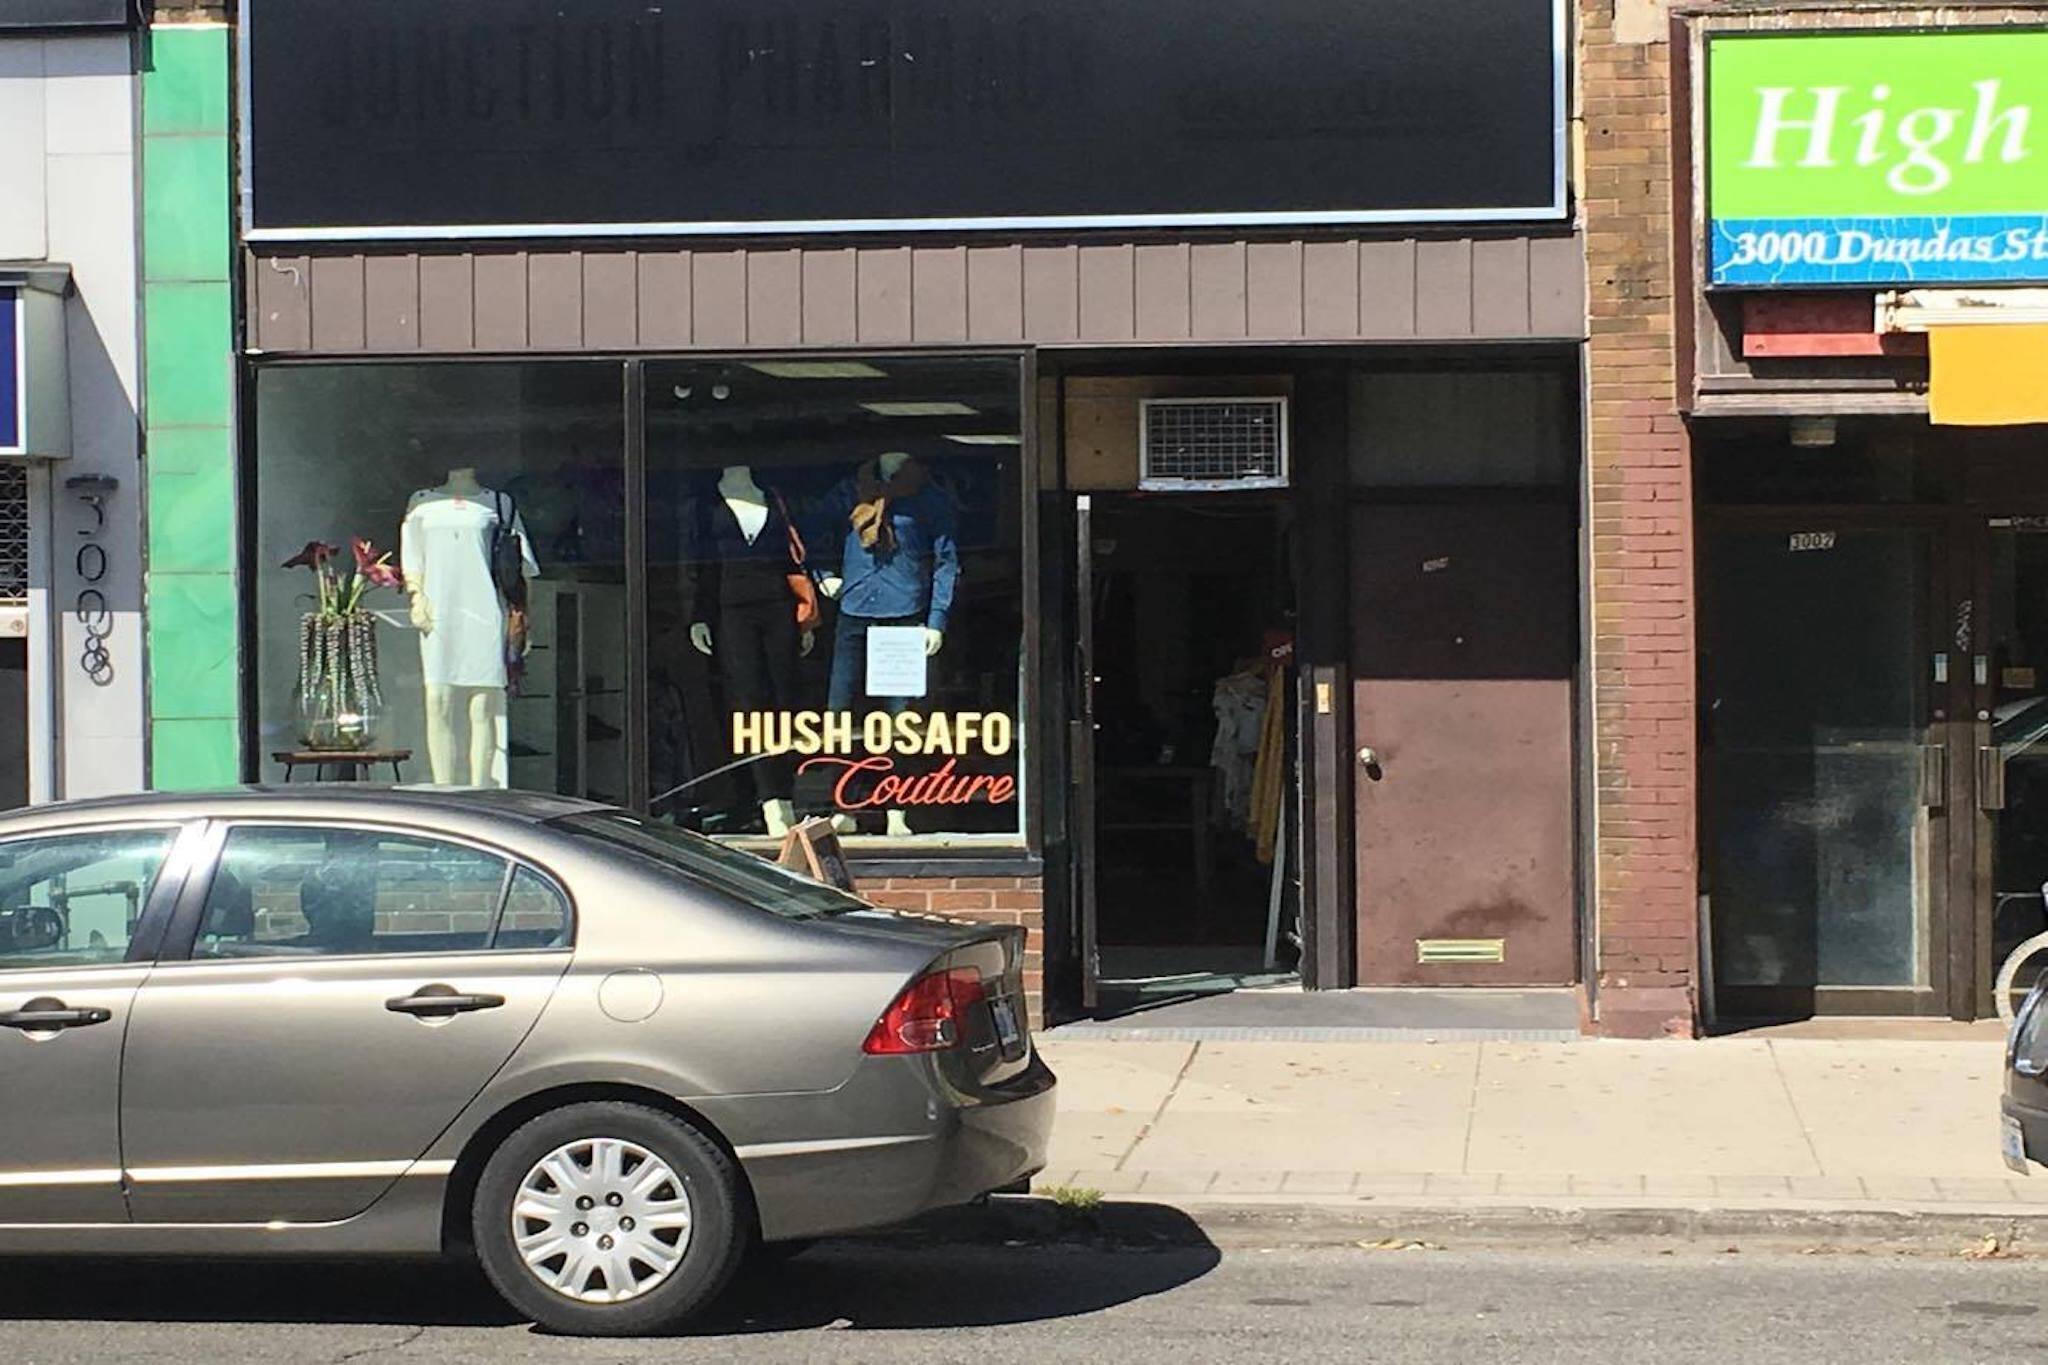 Hush Osafo Toronto